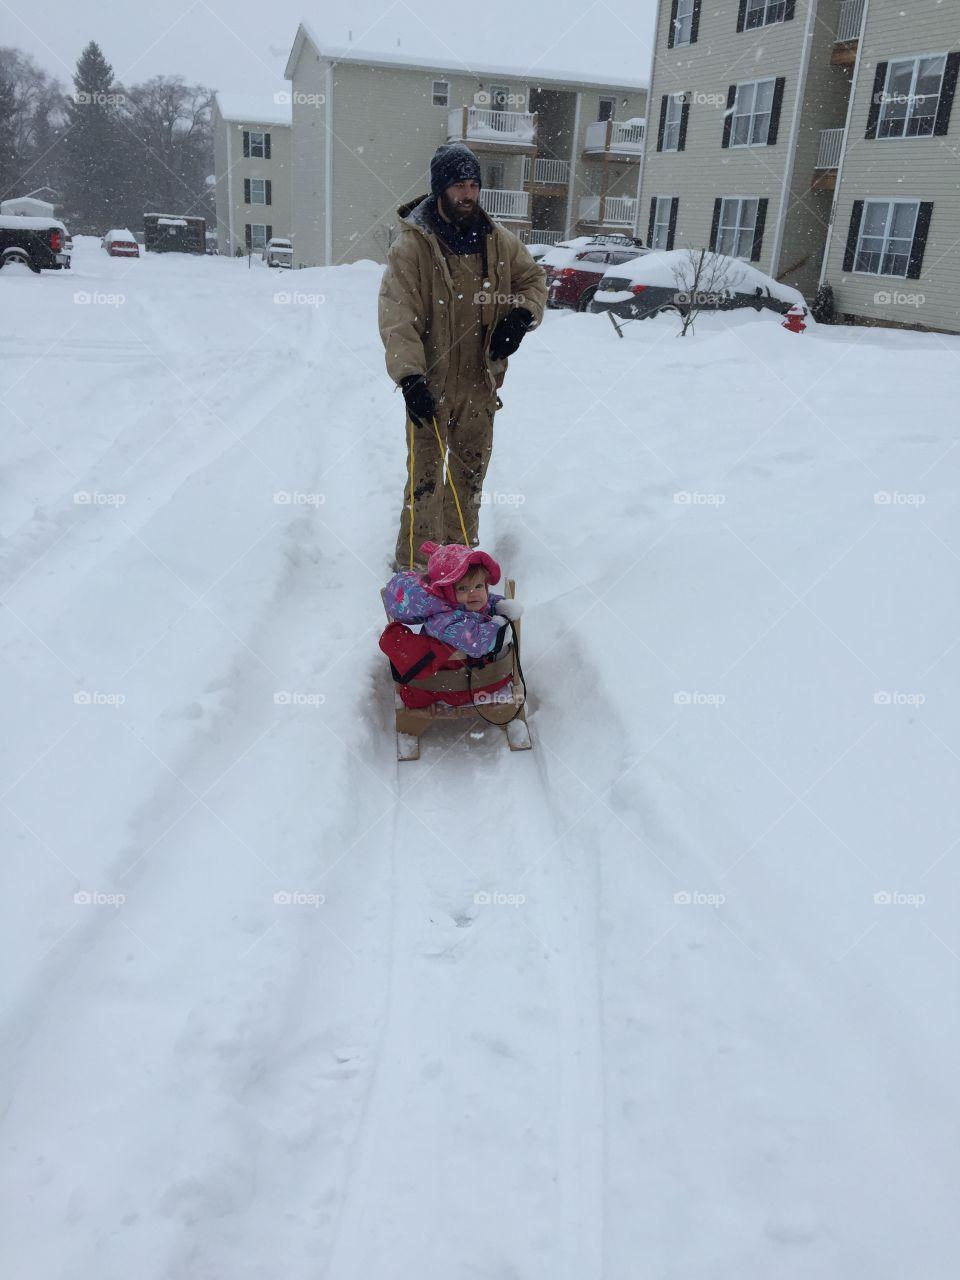 Snow baby. Sledding